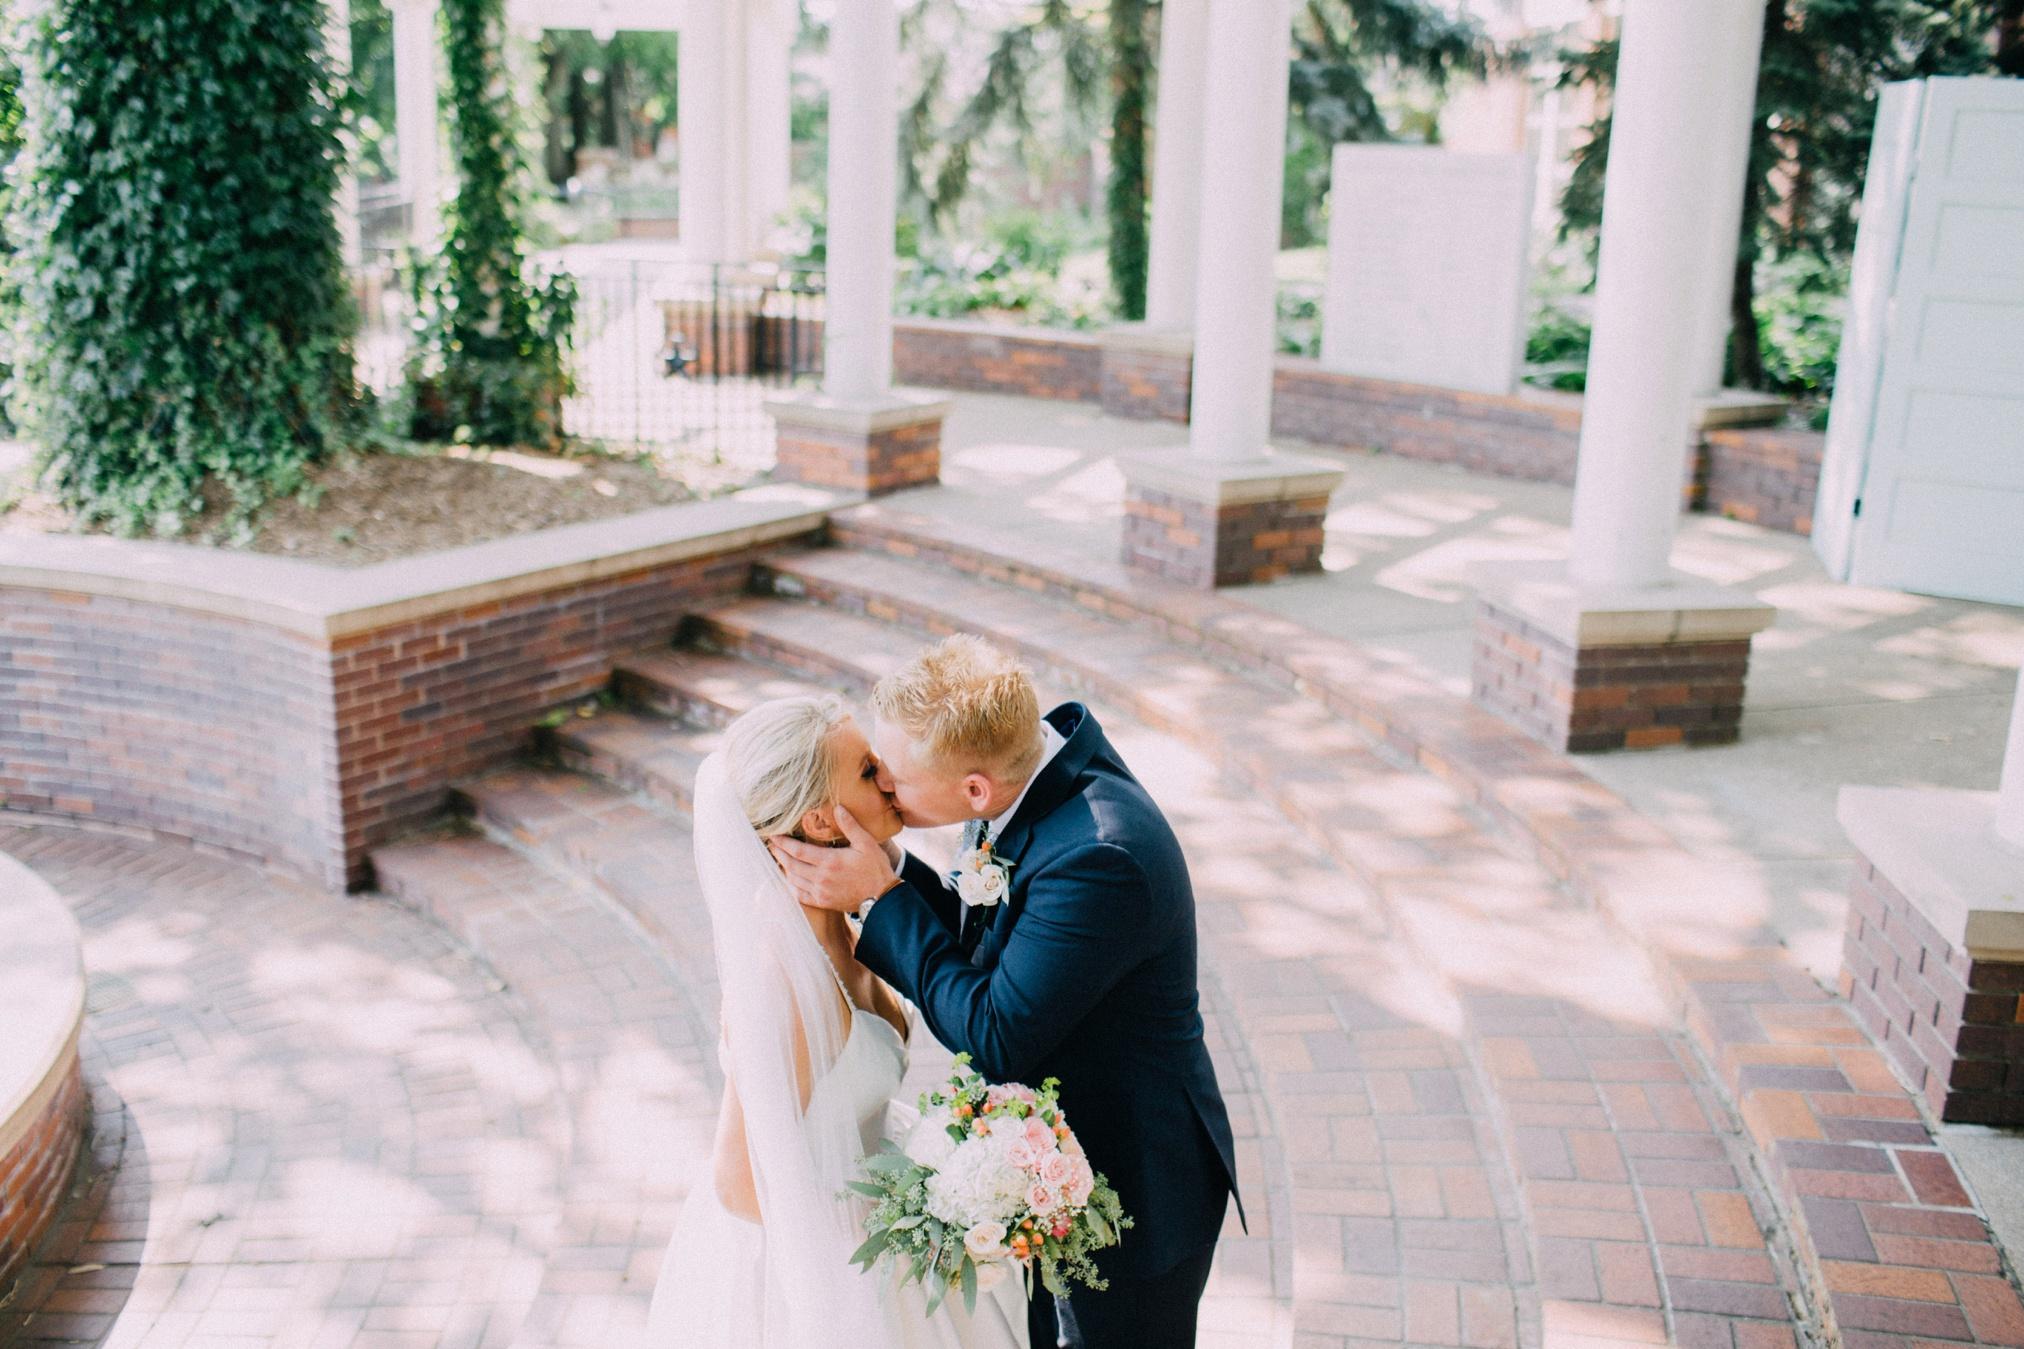 brenna+michael_wedding-292.jpg